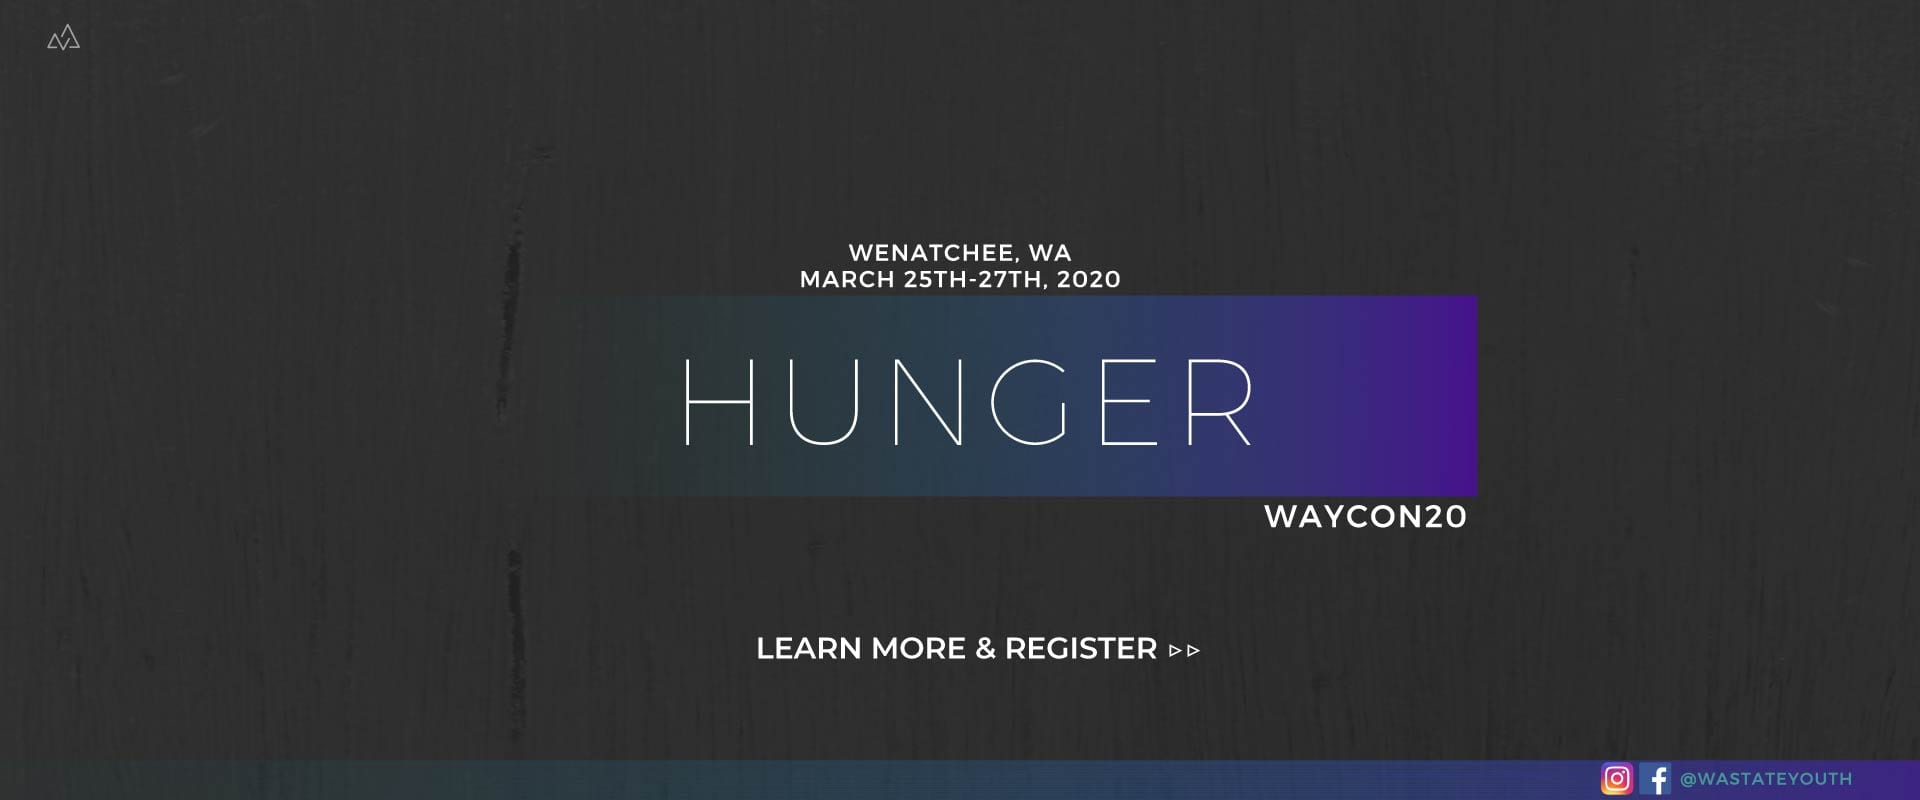 Washington District UPCI WAYCON Youth Convention 2020